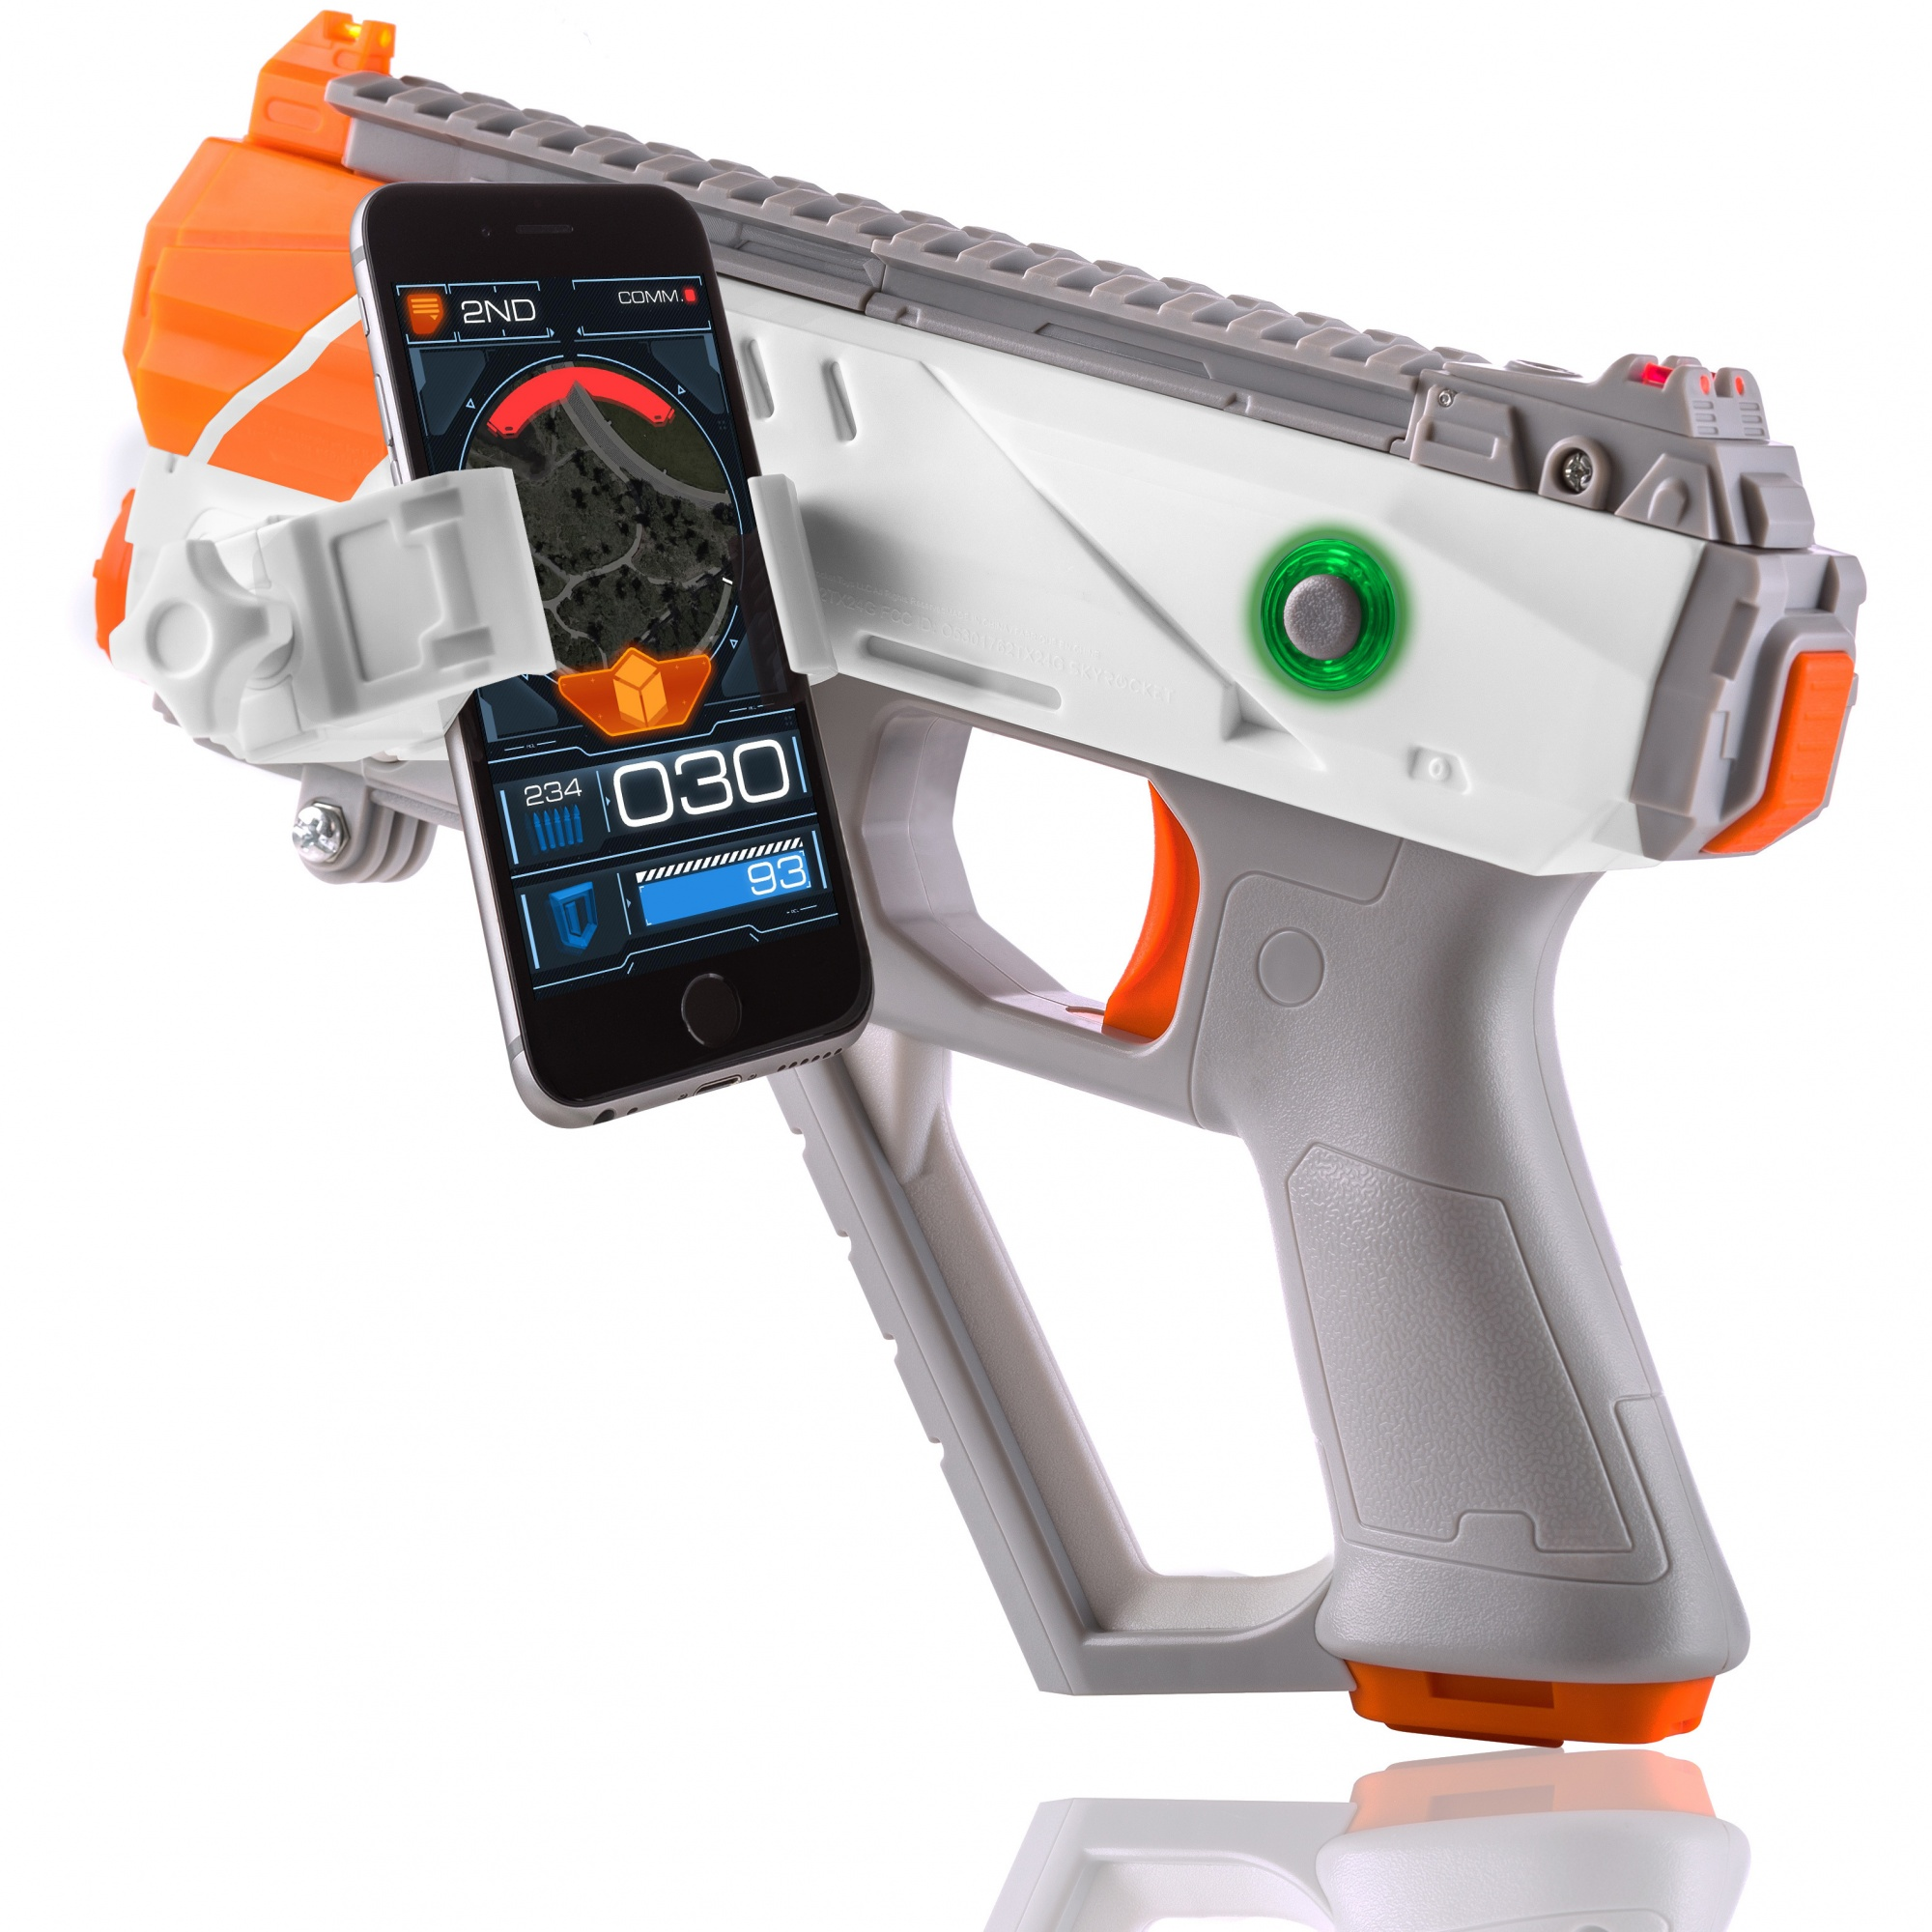 Starter Set Goliath Toys Recoil GPS Laser Combat Spiele